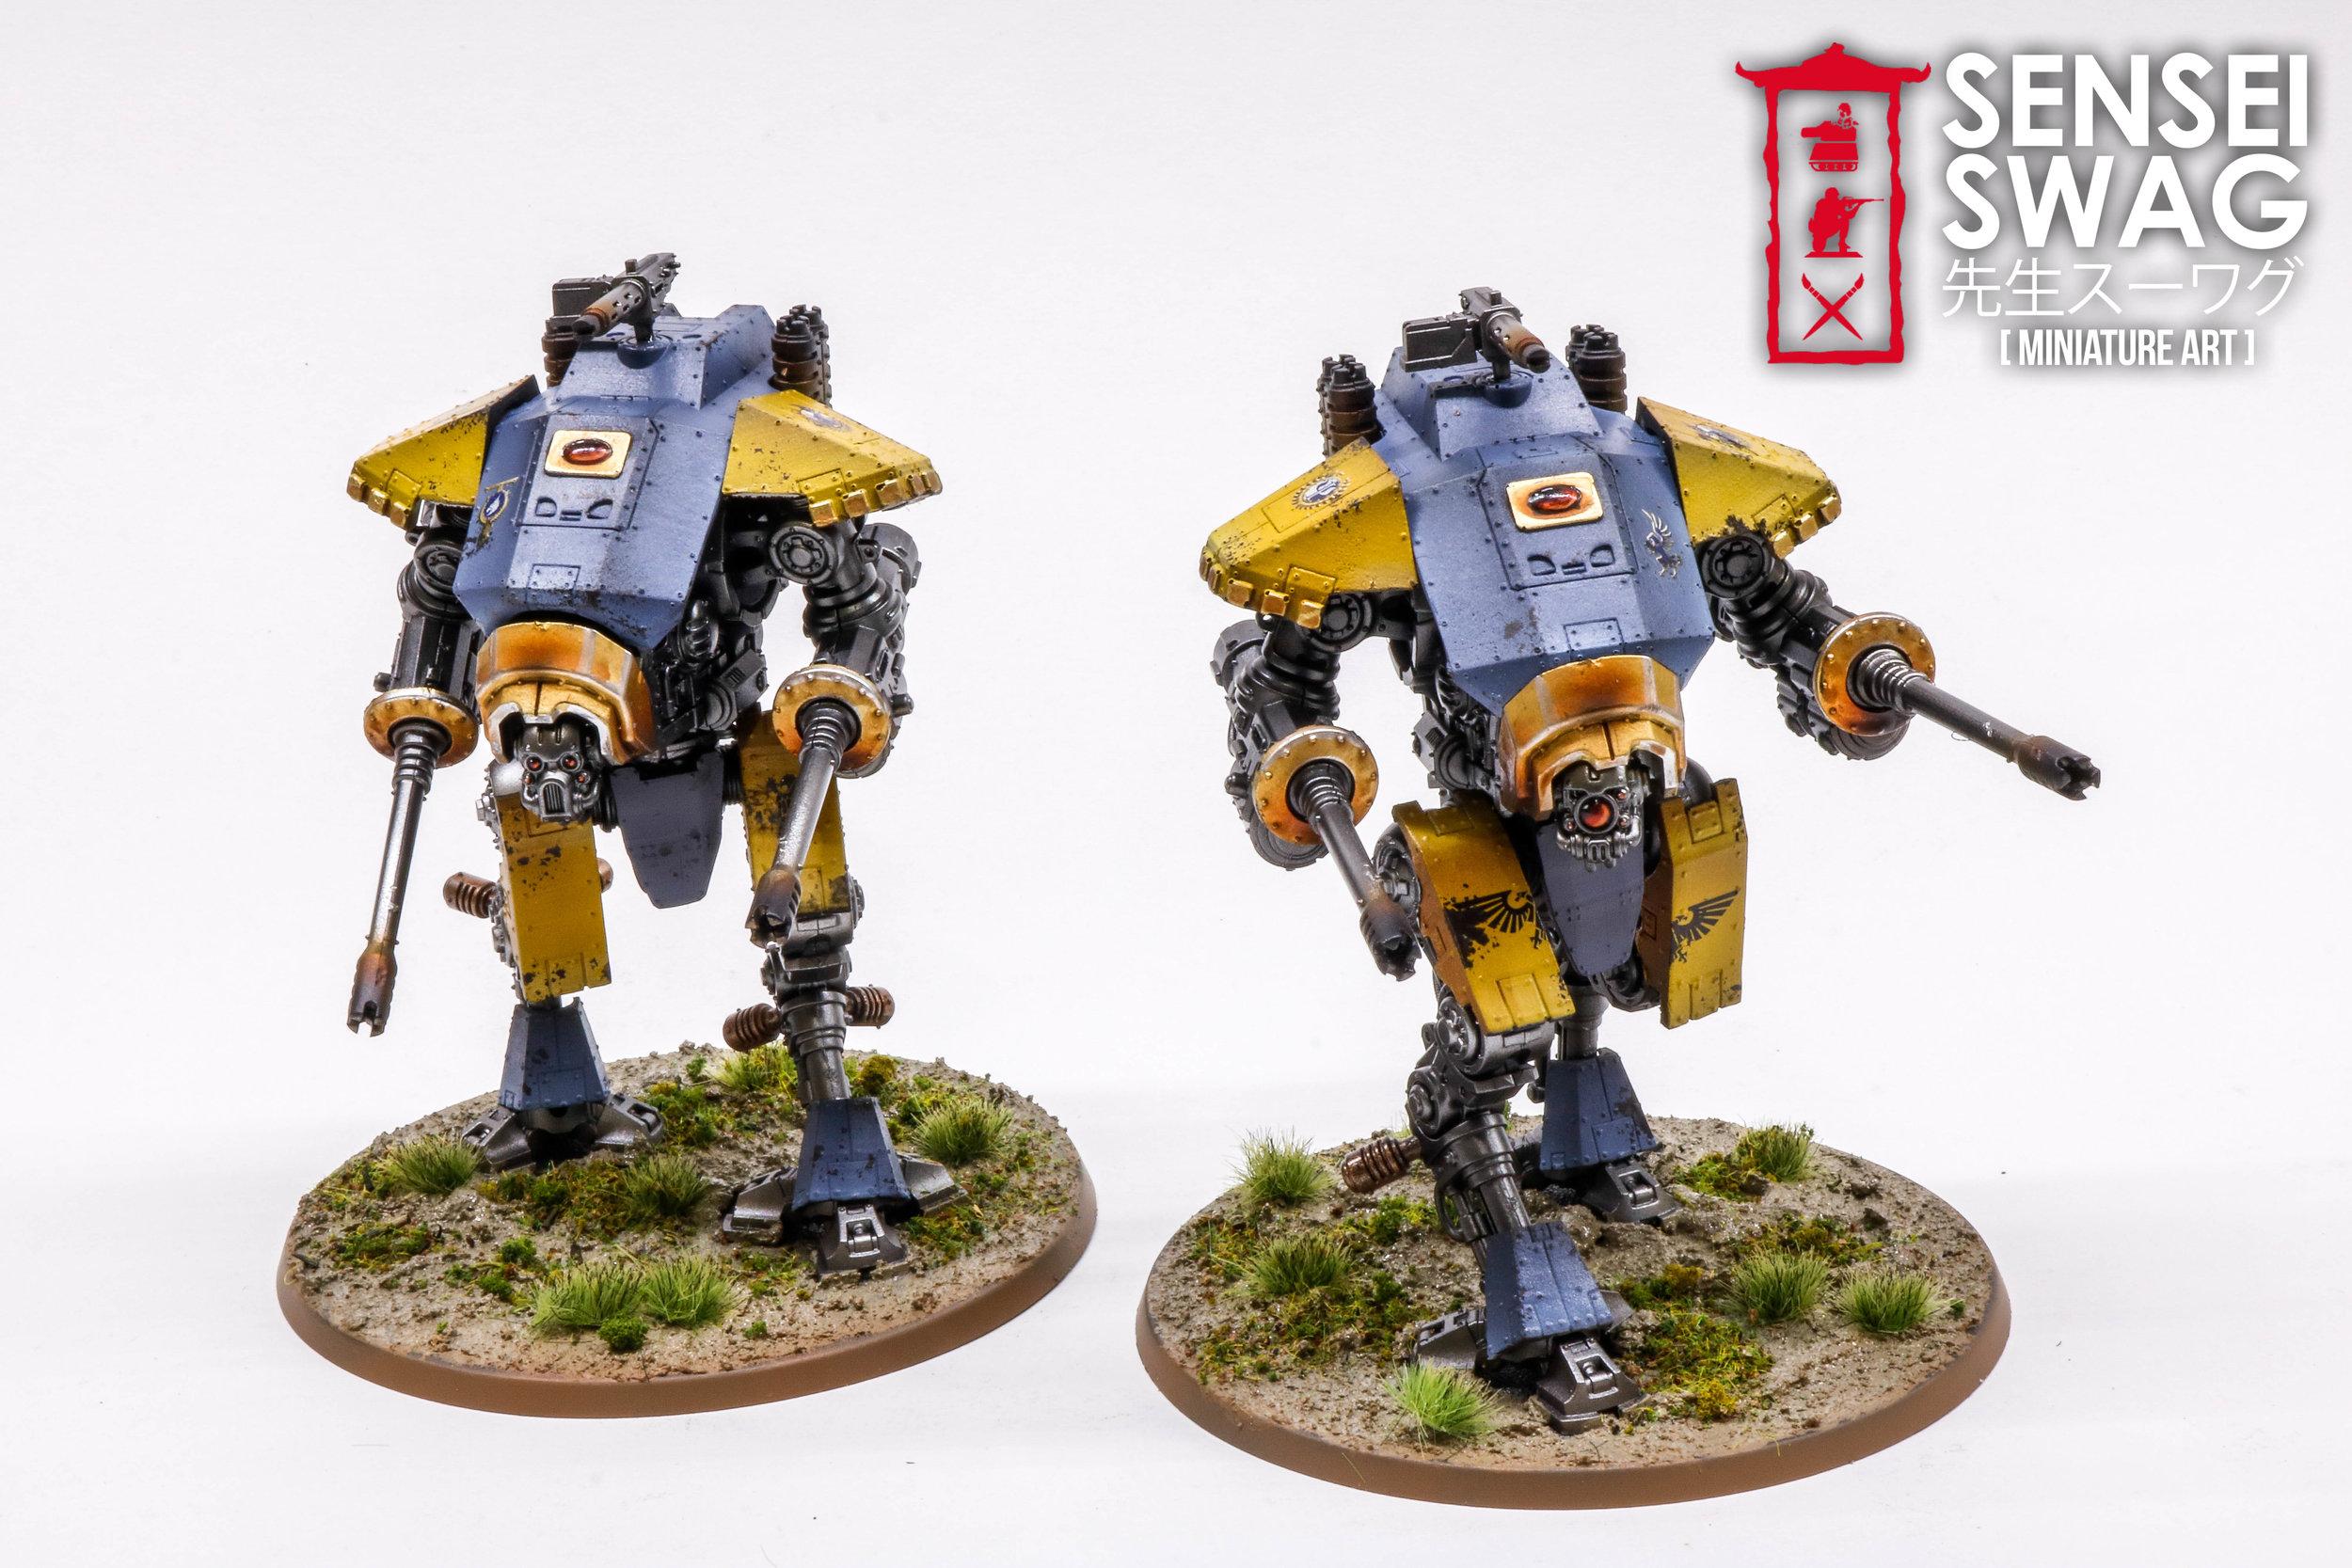 House Coldshroud Imperial Knight Valiant Legio Gryphonicus Armiger Warden Preceptor-7.jpg